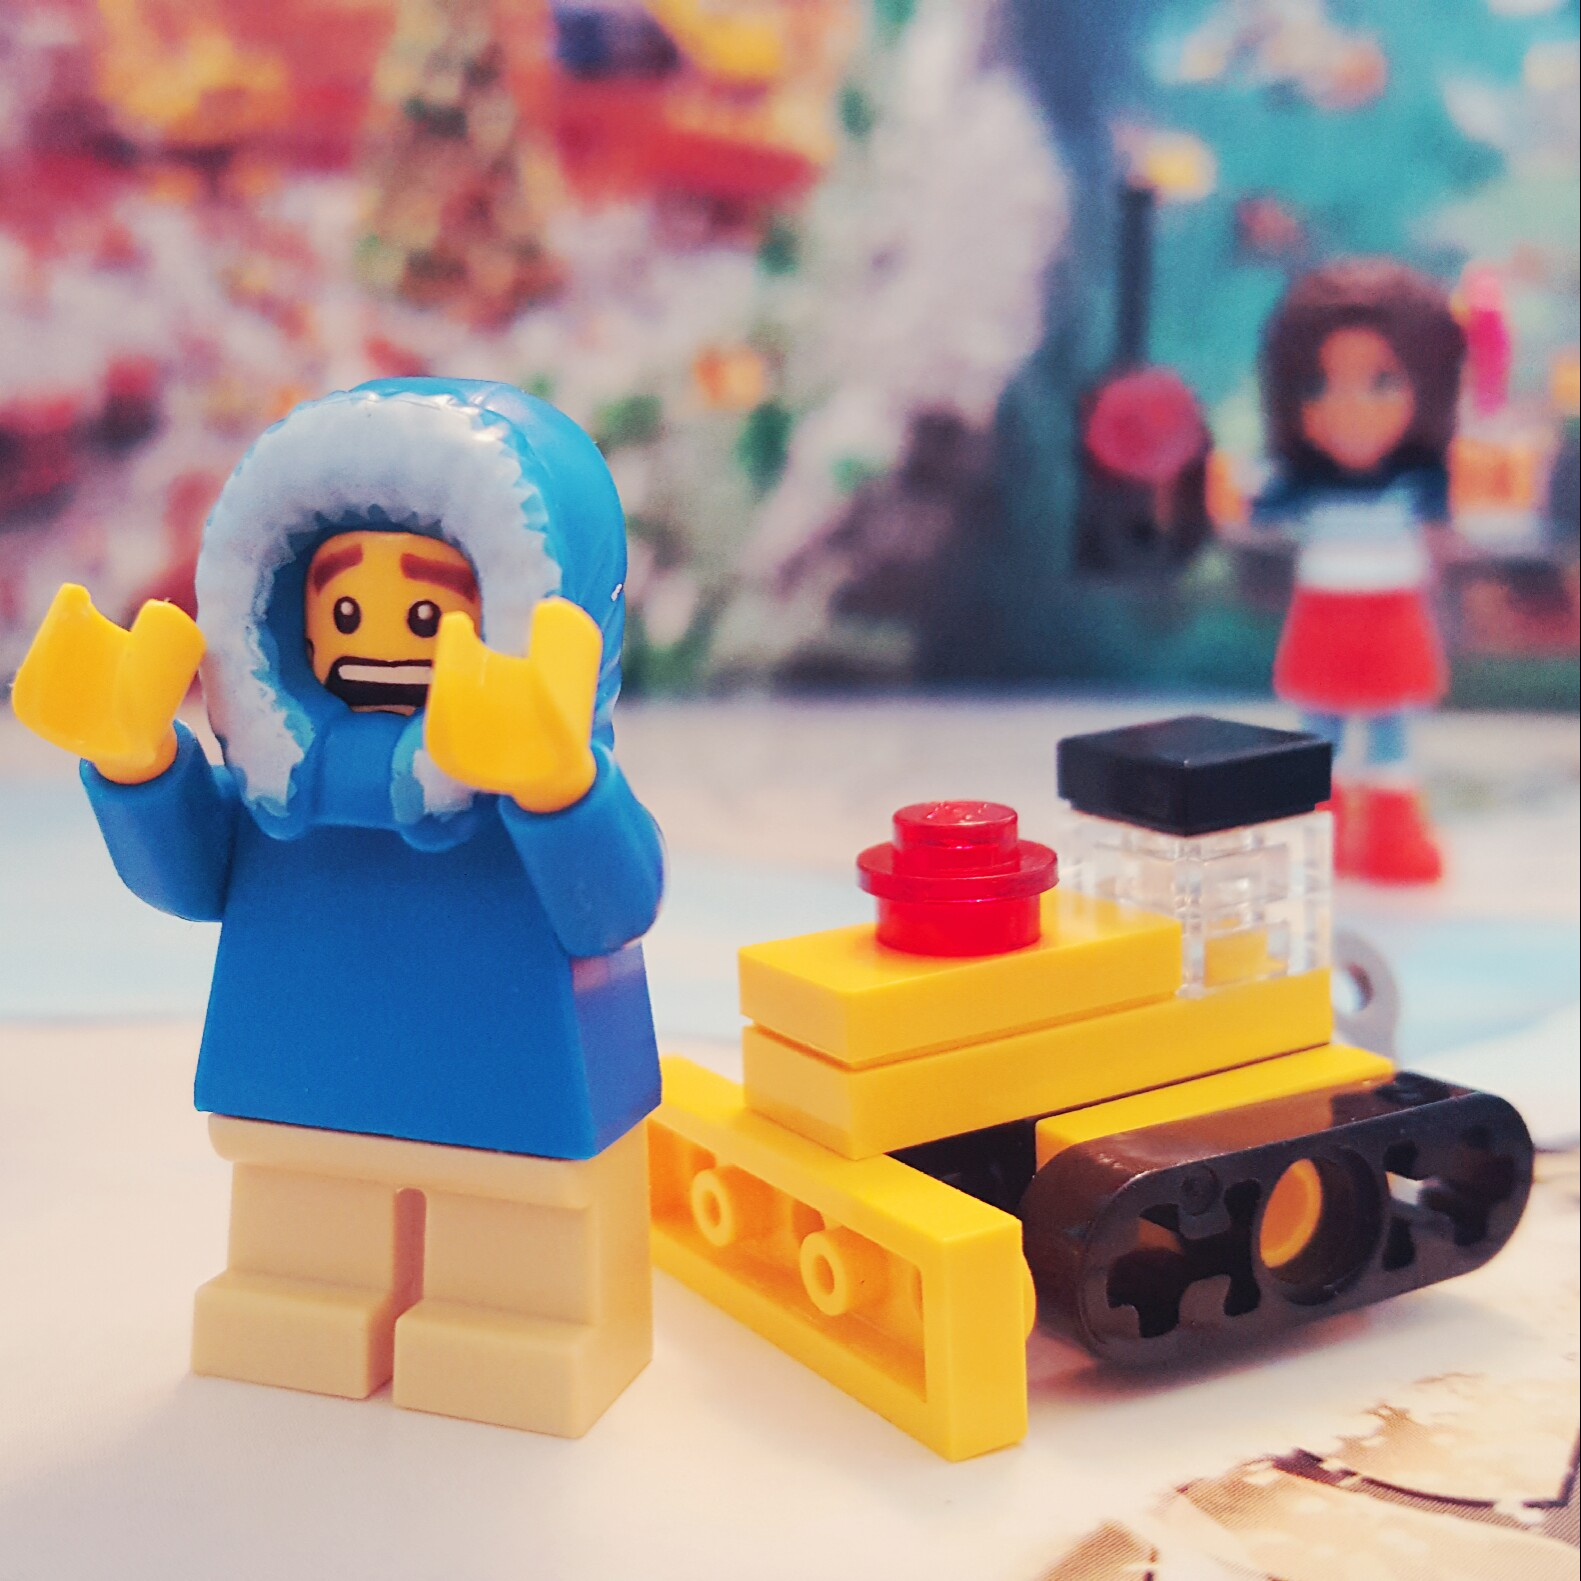 Day 6 Bulldozer from LEGO City Advent Calendar